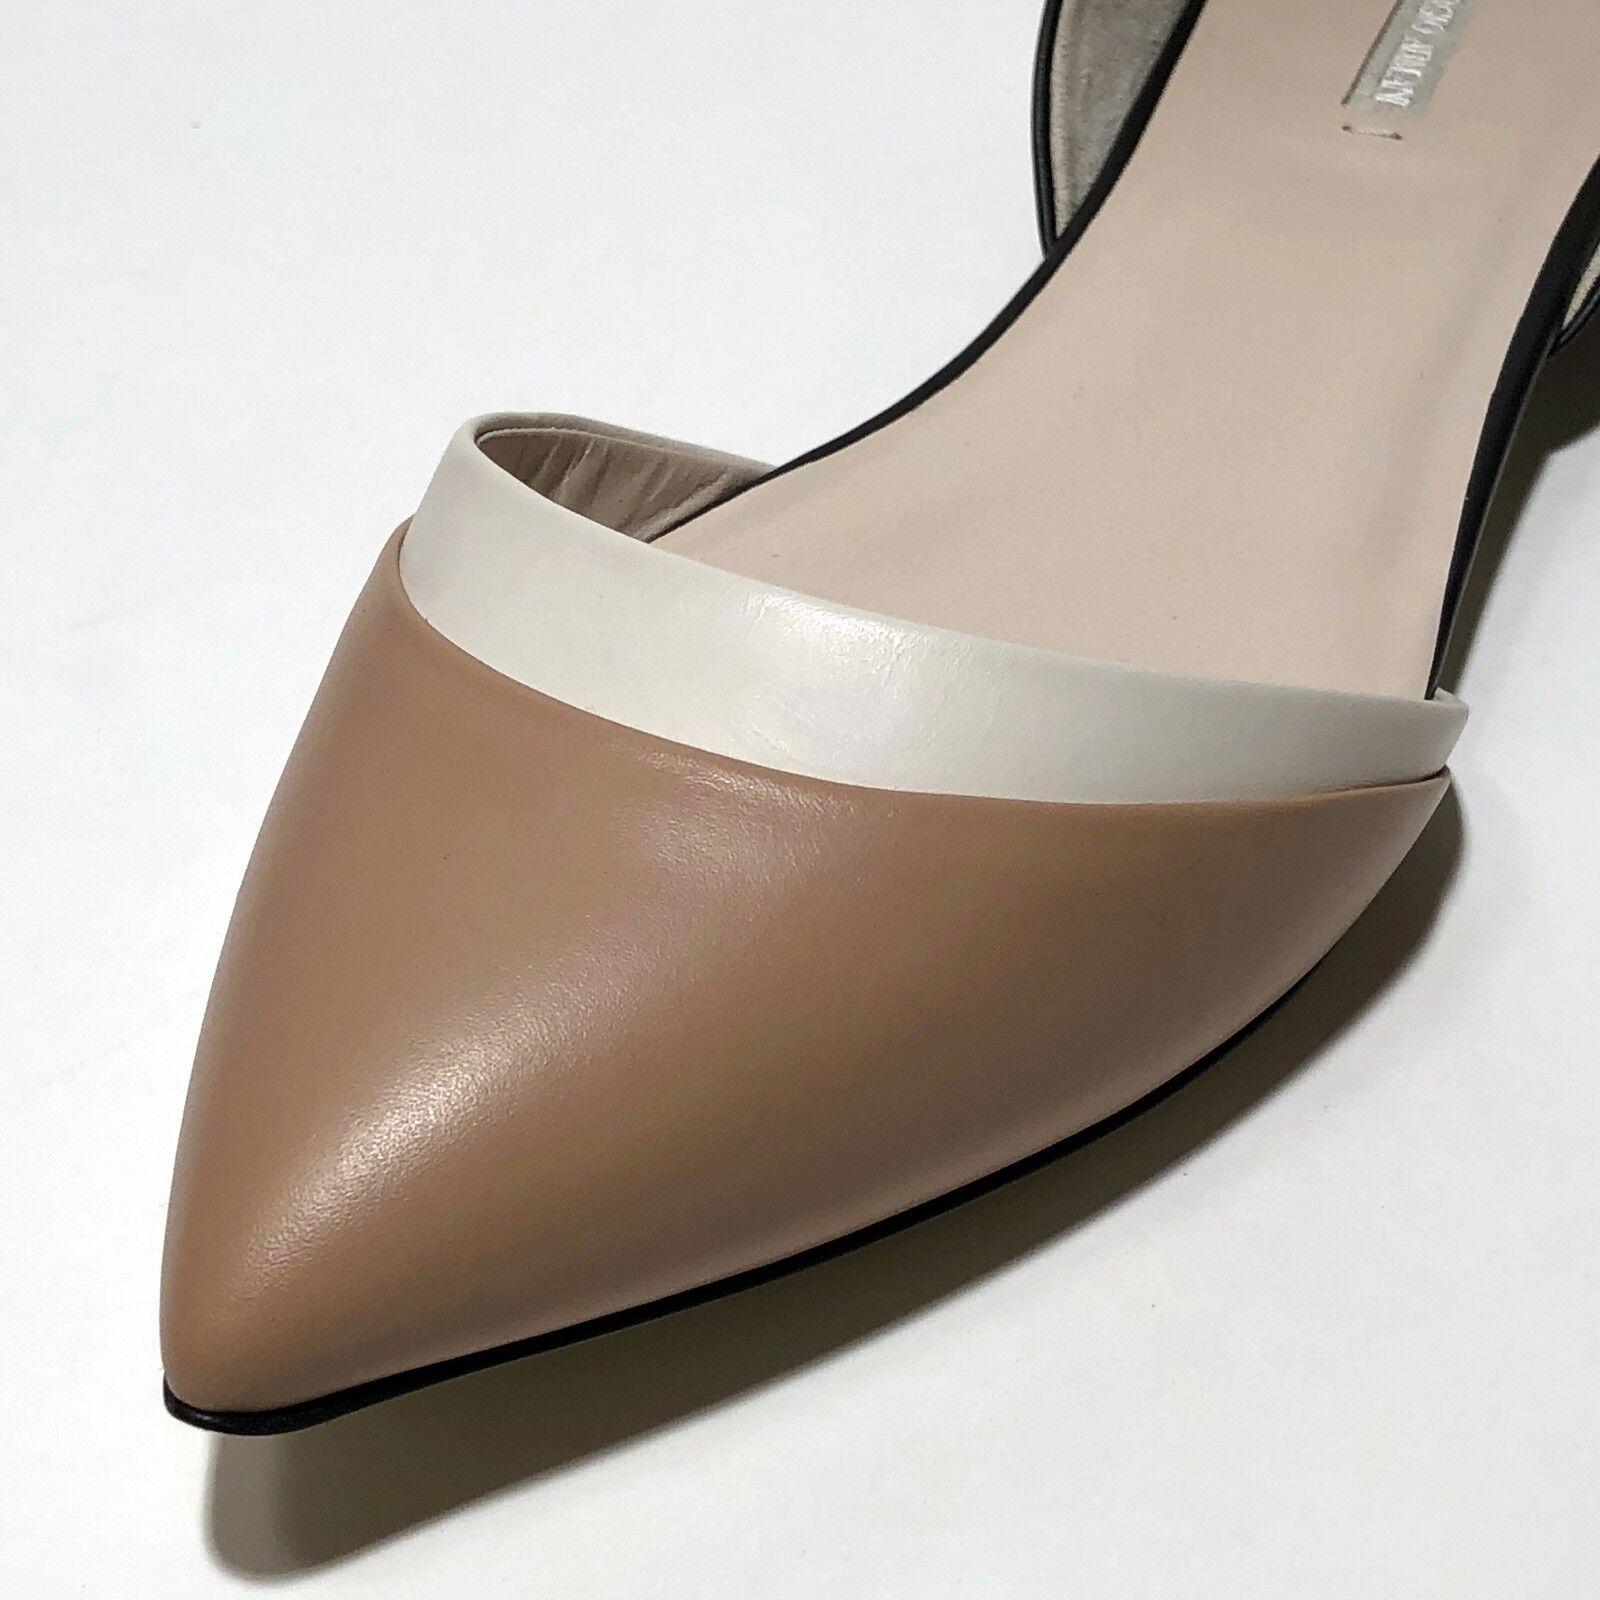 Giorgio Armani Mujer  595 595 595 Negro Marrón Cuero X1D197 desnuda 11 41 Pisos De Moda  mas barato